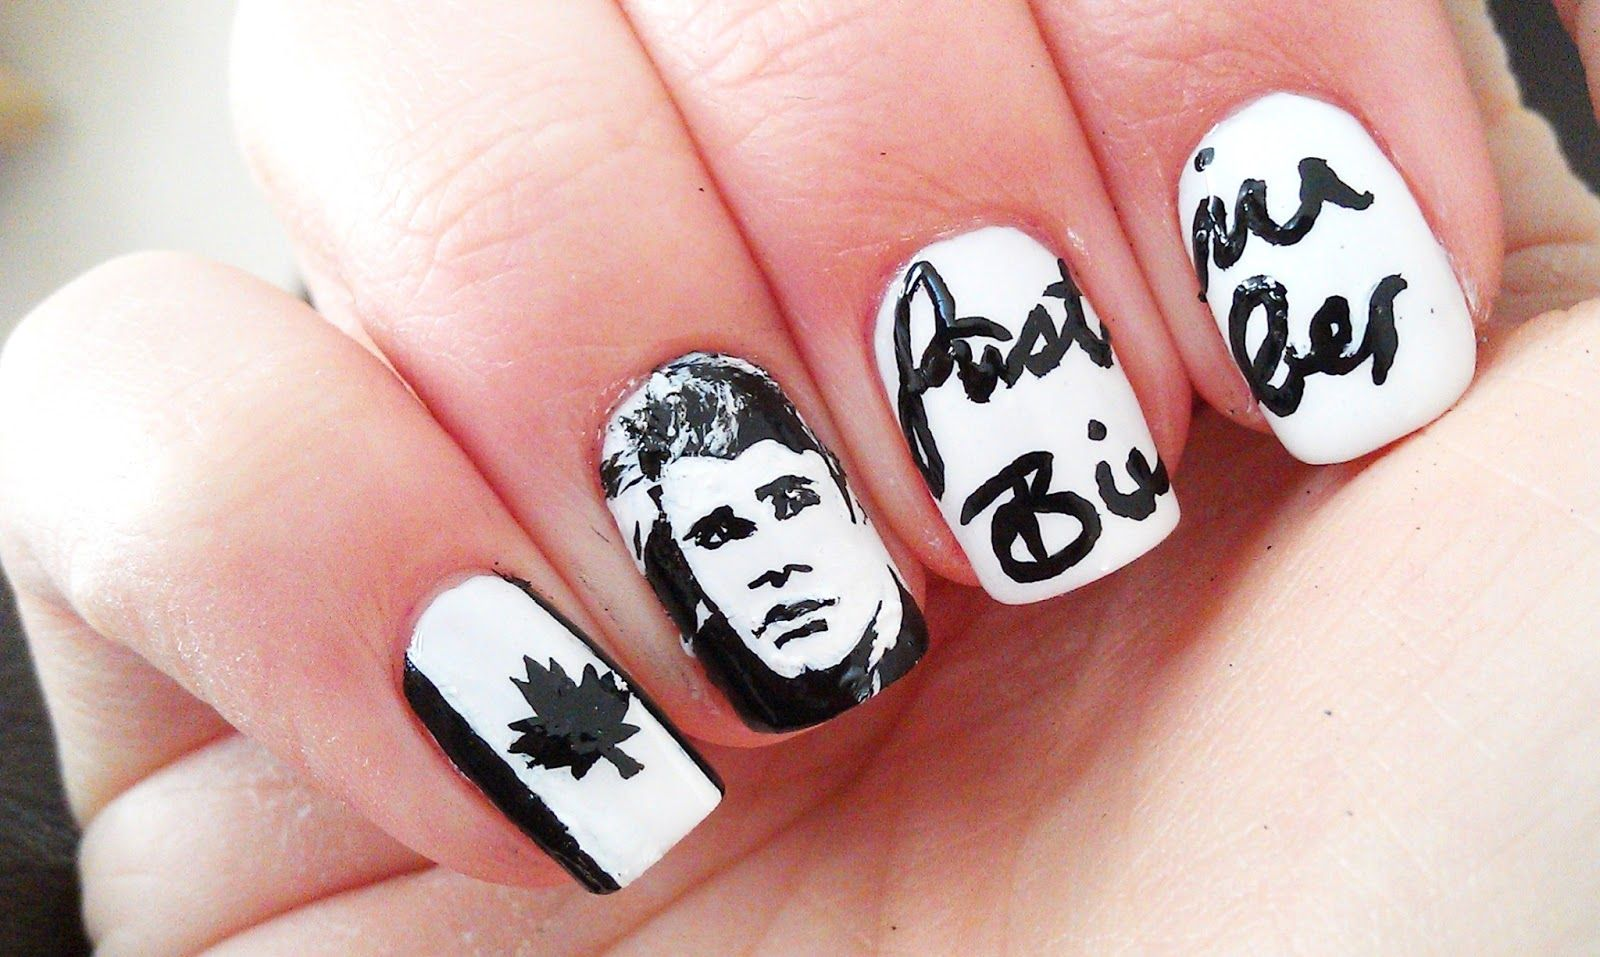 Aweosome Justin Bieber Nail Art♤   Nails   Pinterest   Justin ...